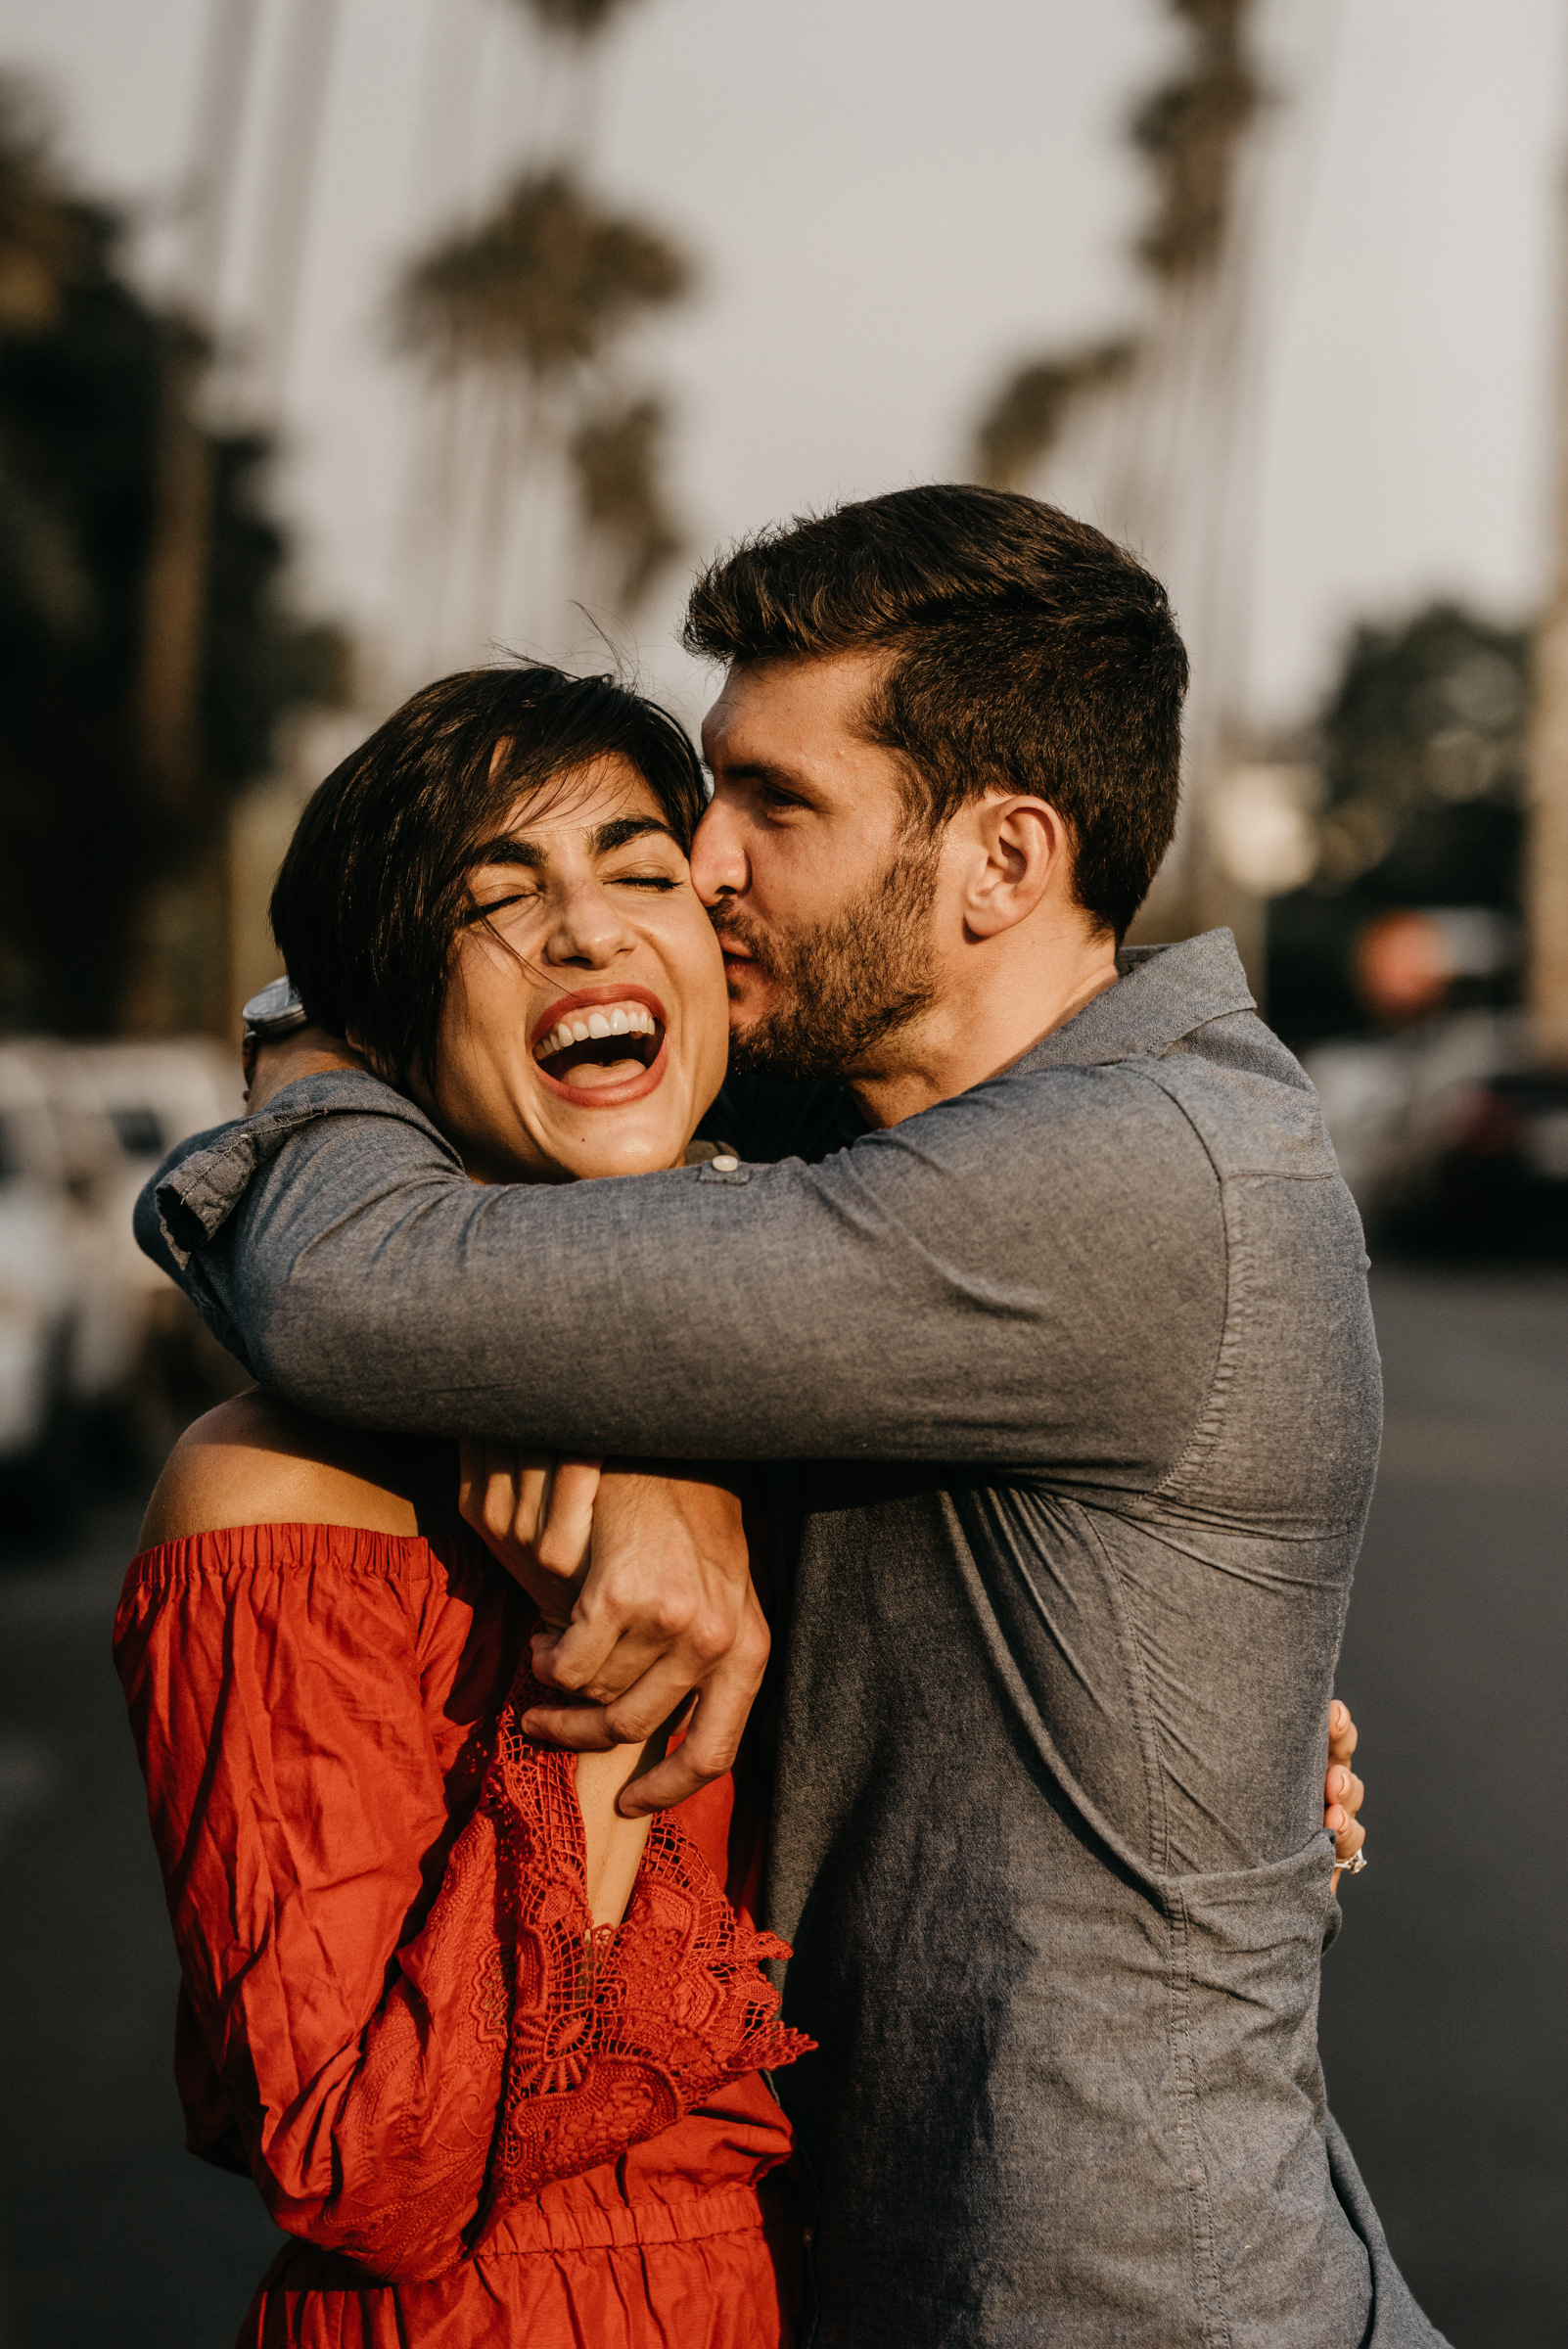 Isaiah + Taylor Photography - Santa Monica Engagement Session, Los Angeles Wedding Photographer-012.jpg